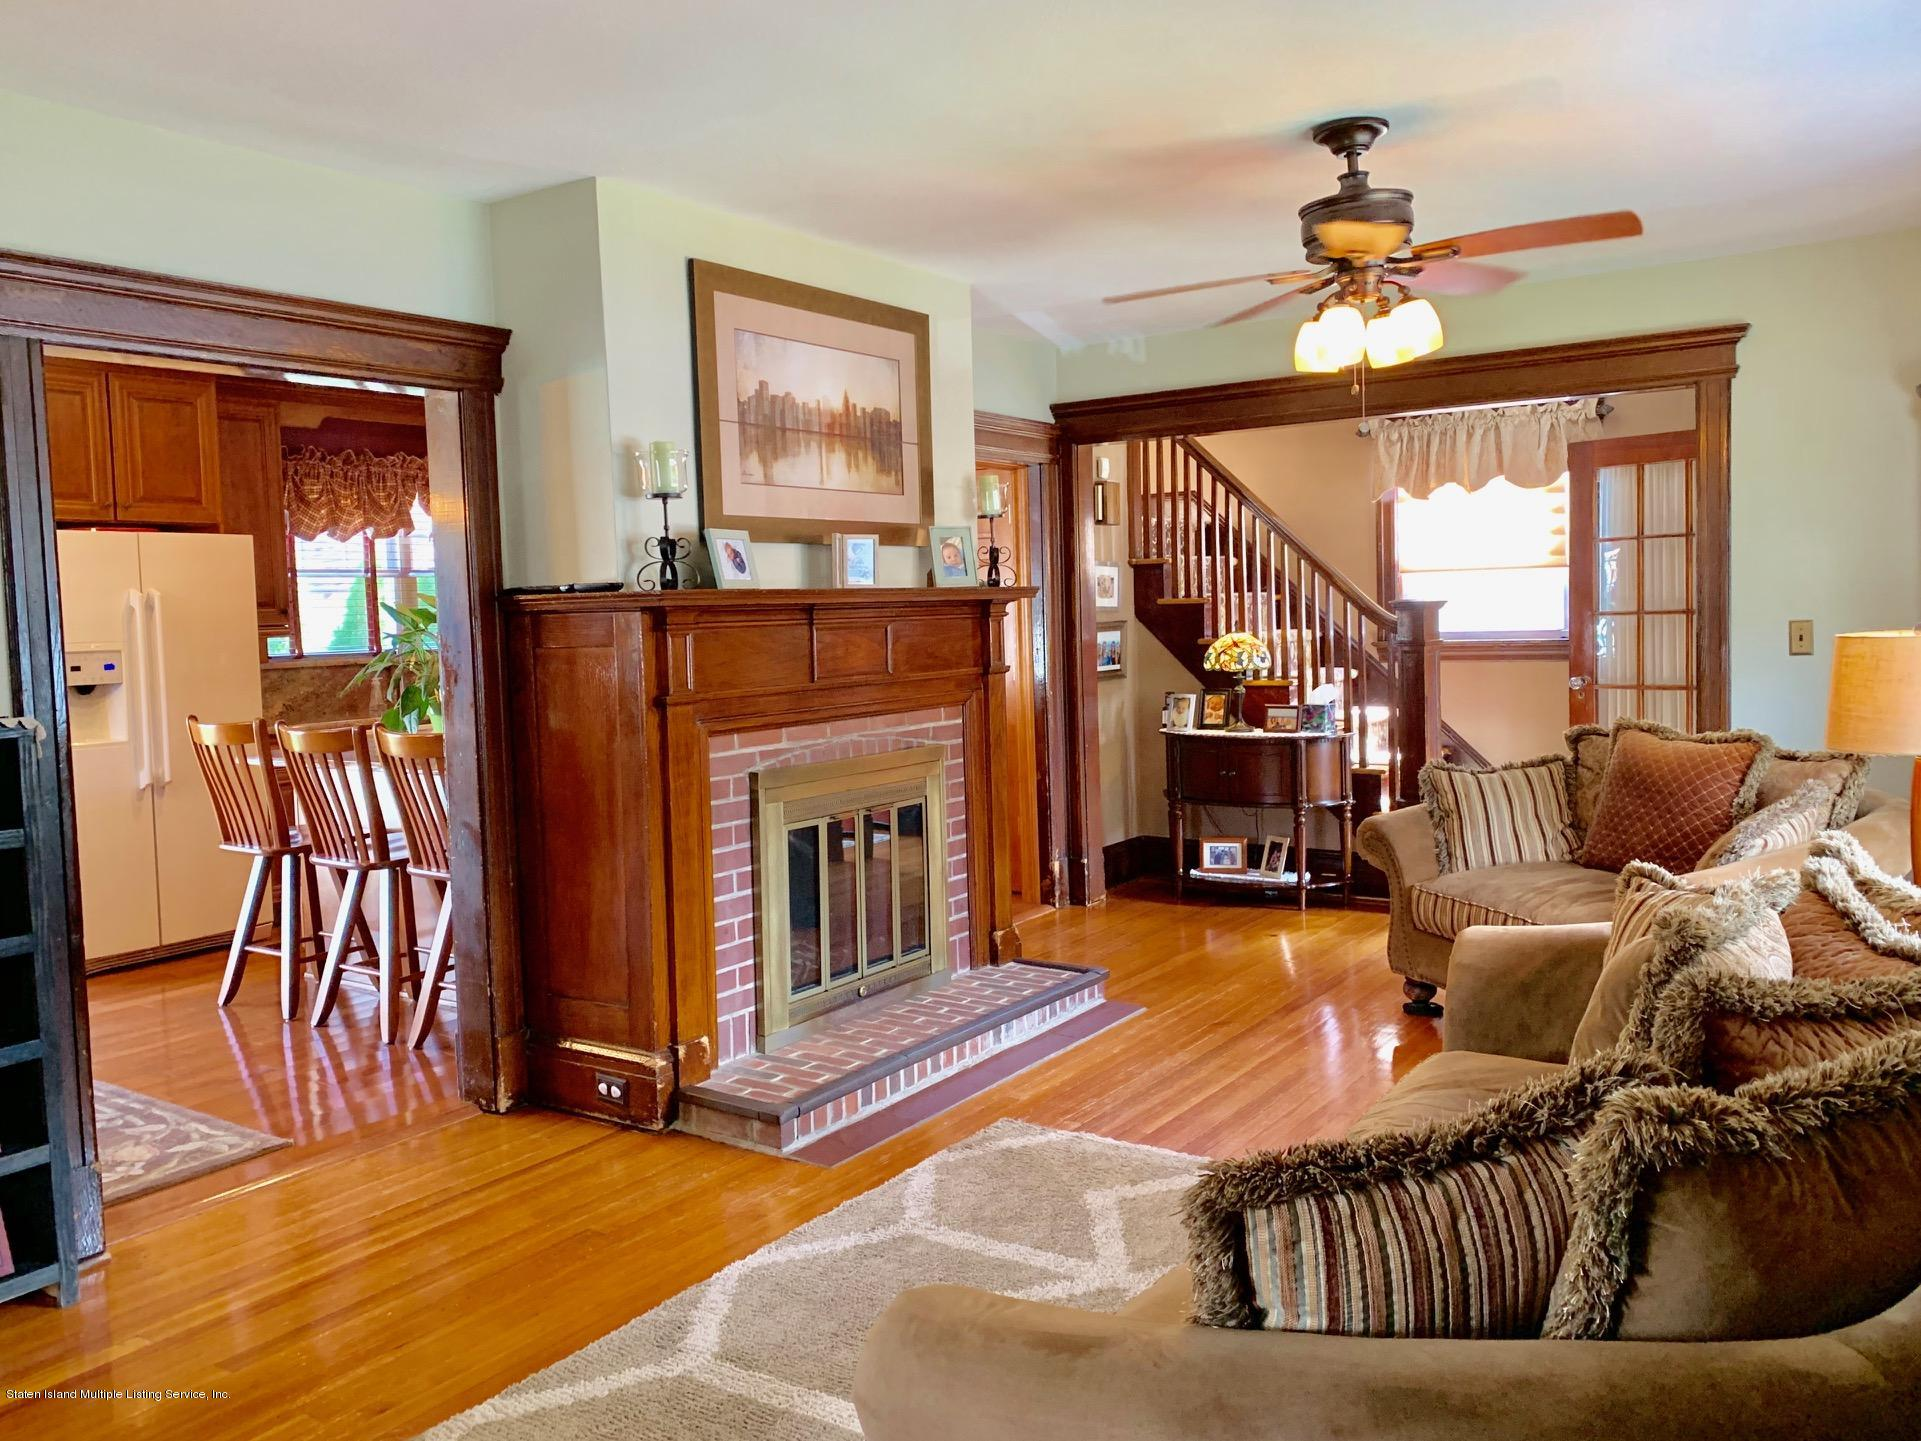 Single Family - Detached 195 Fairview Avenue  Staten Island, NY 10314, MLS-1132423-9